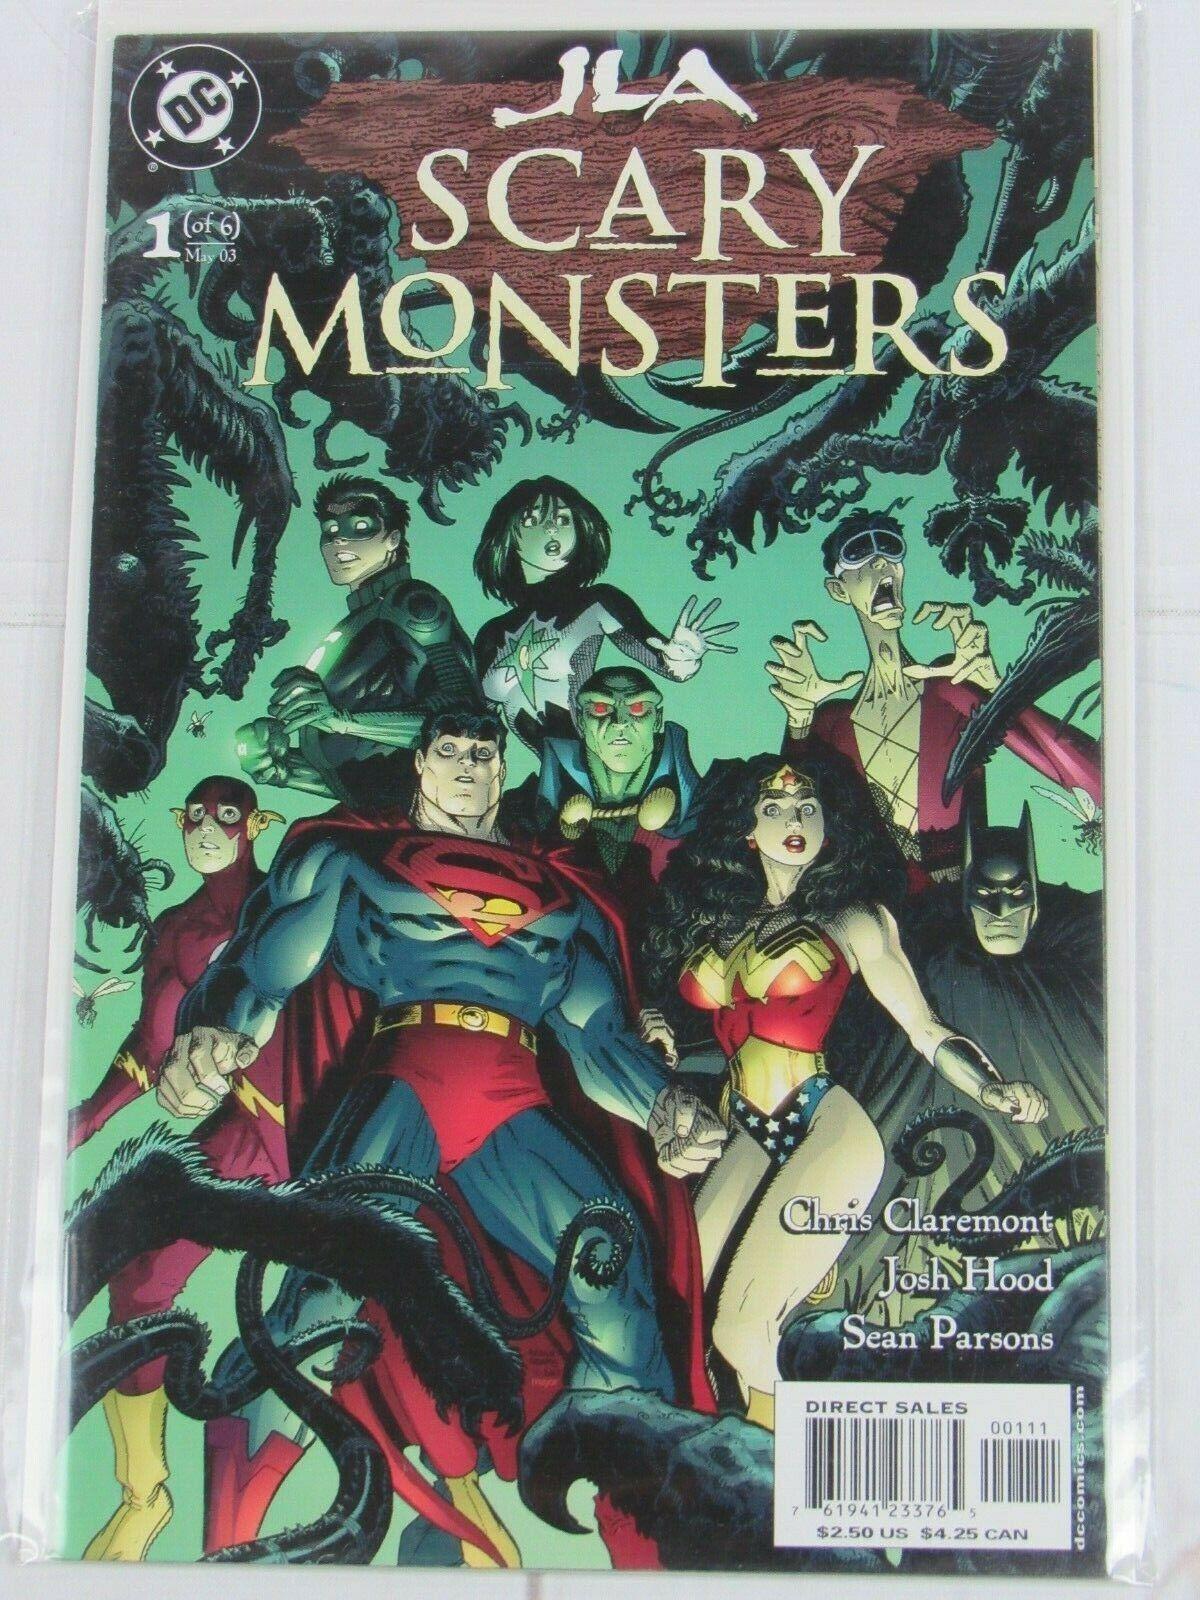 JLA Scary Monsters #1 DC Comics 2003 - C4960